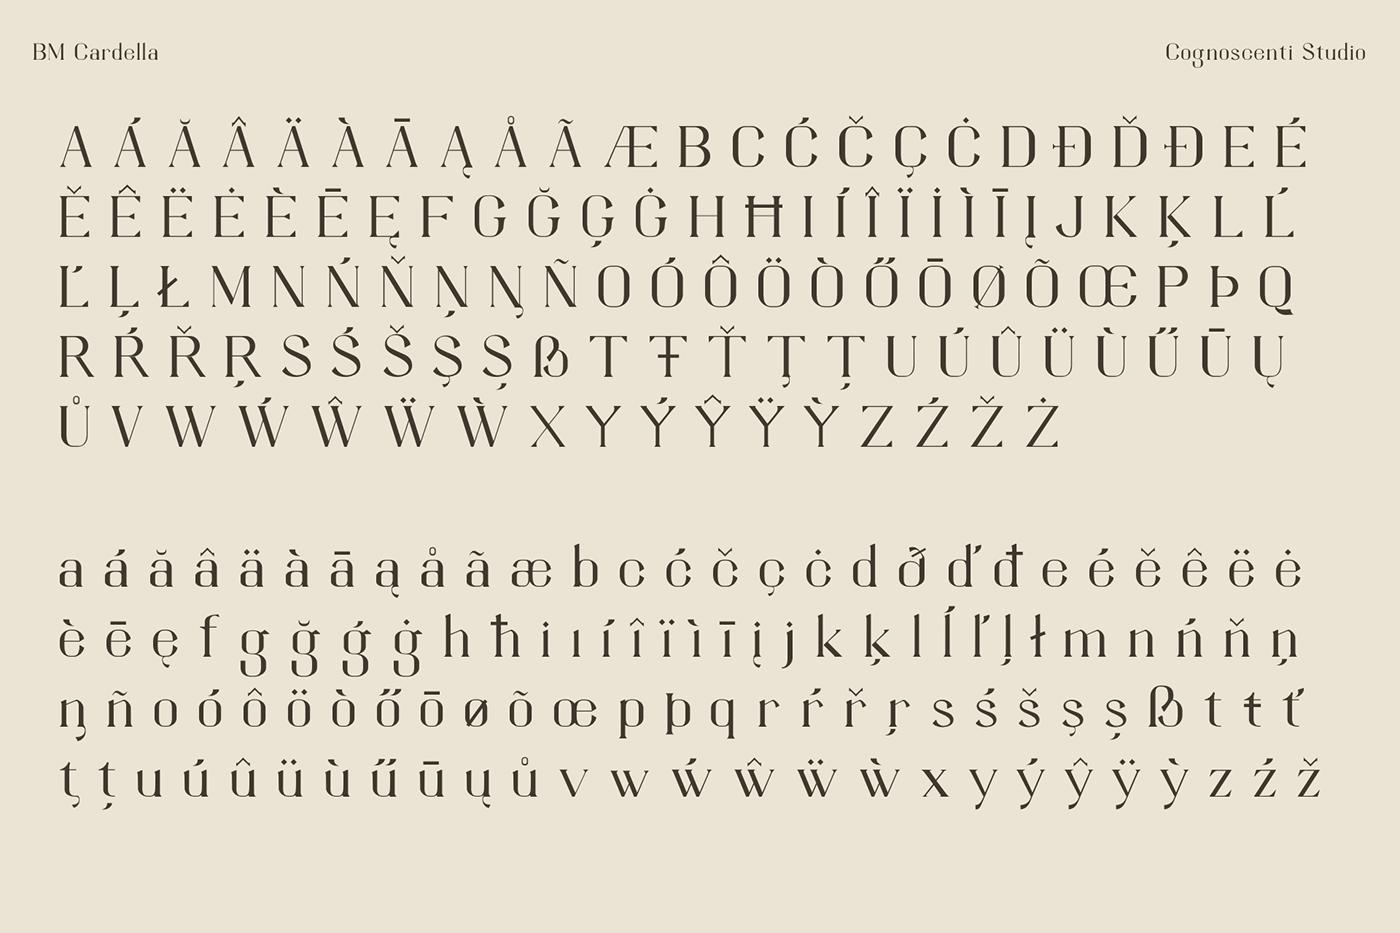 Image may contain: handwriting, screenshot and typography